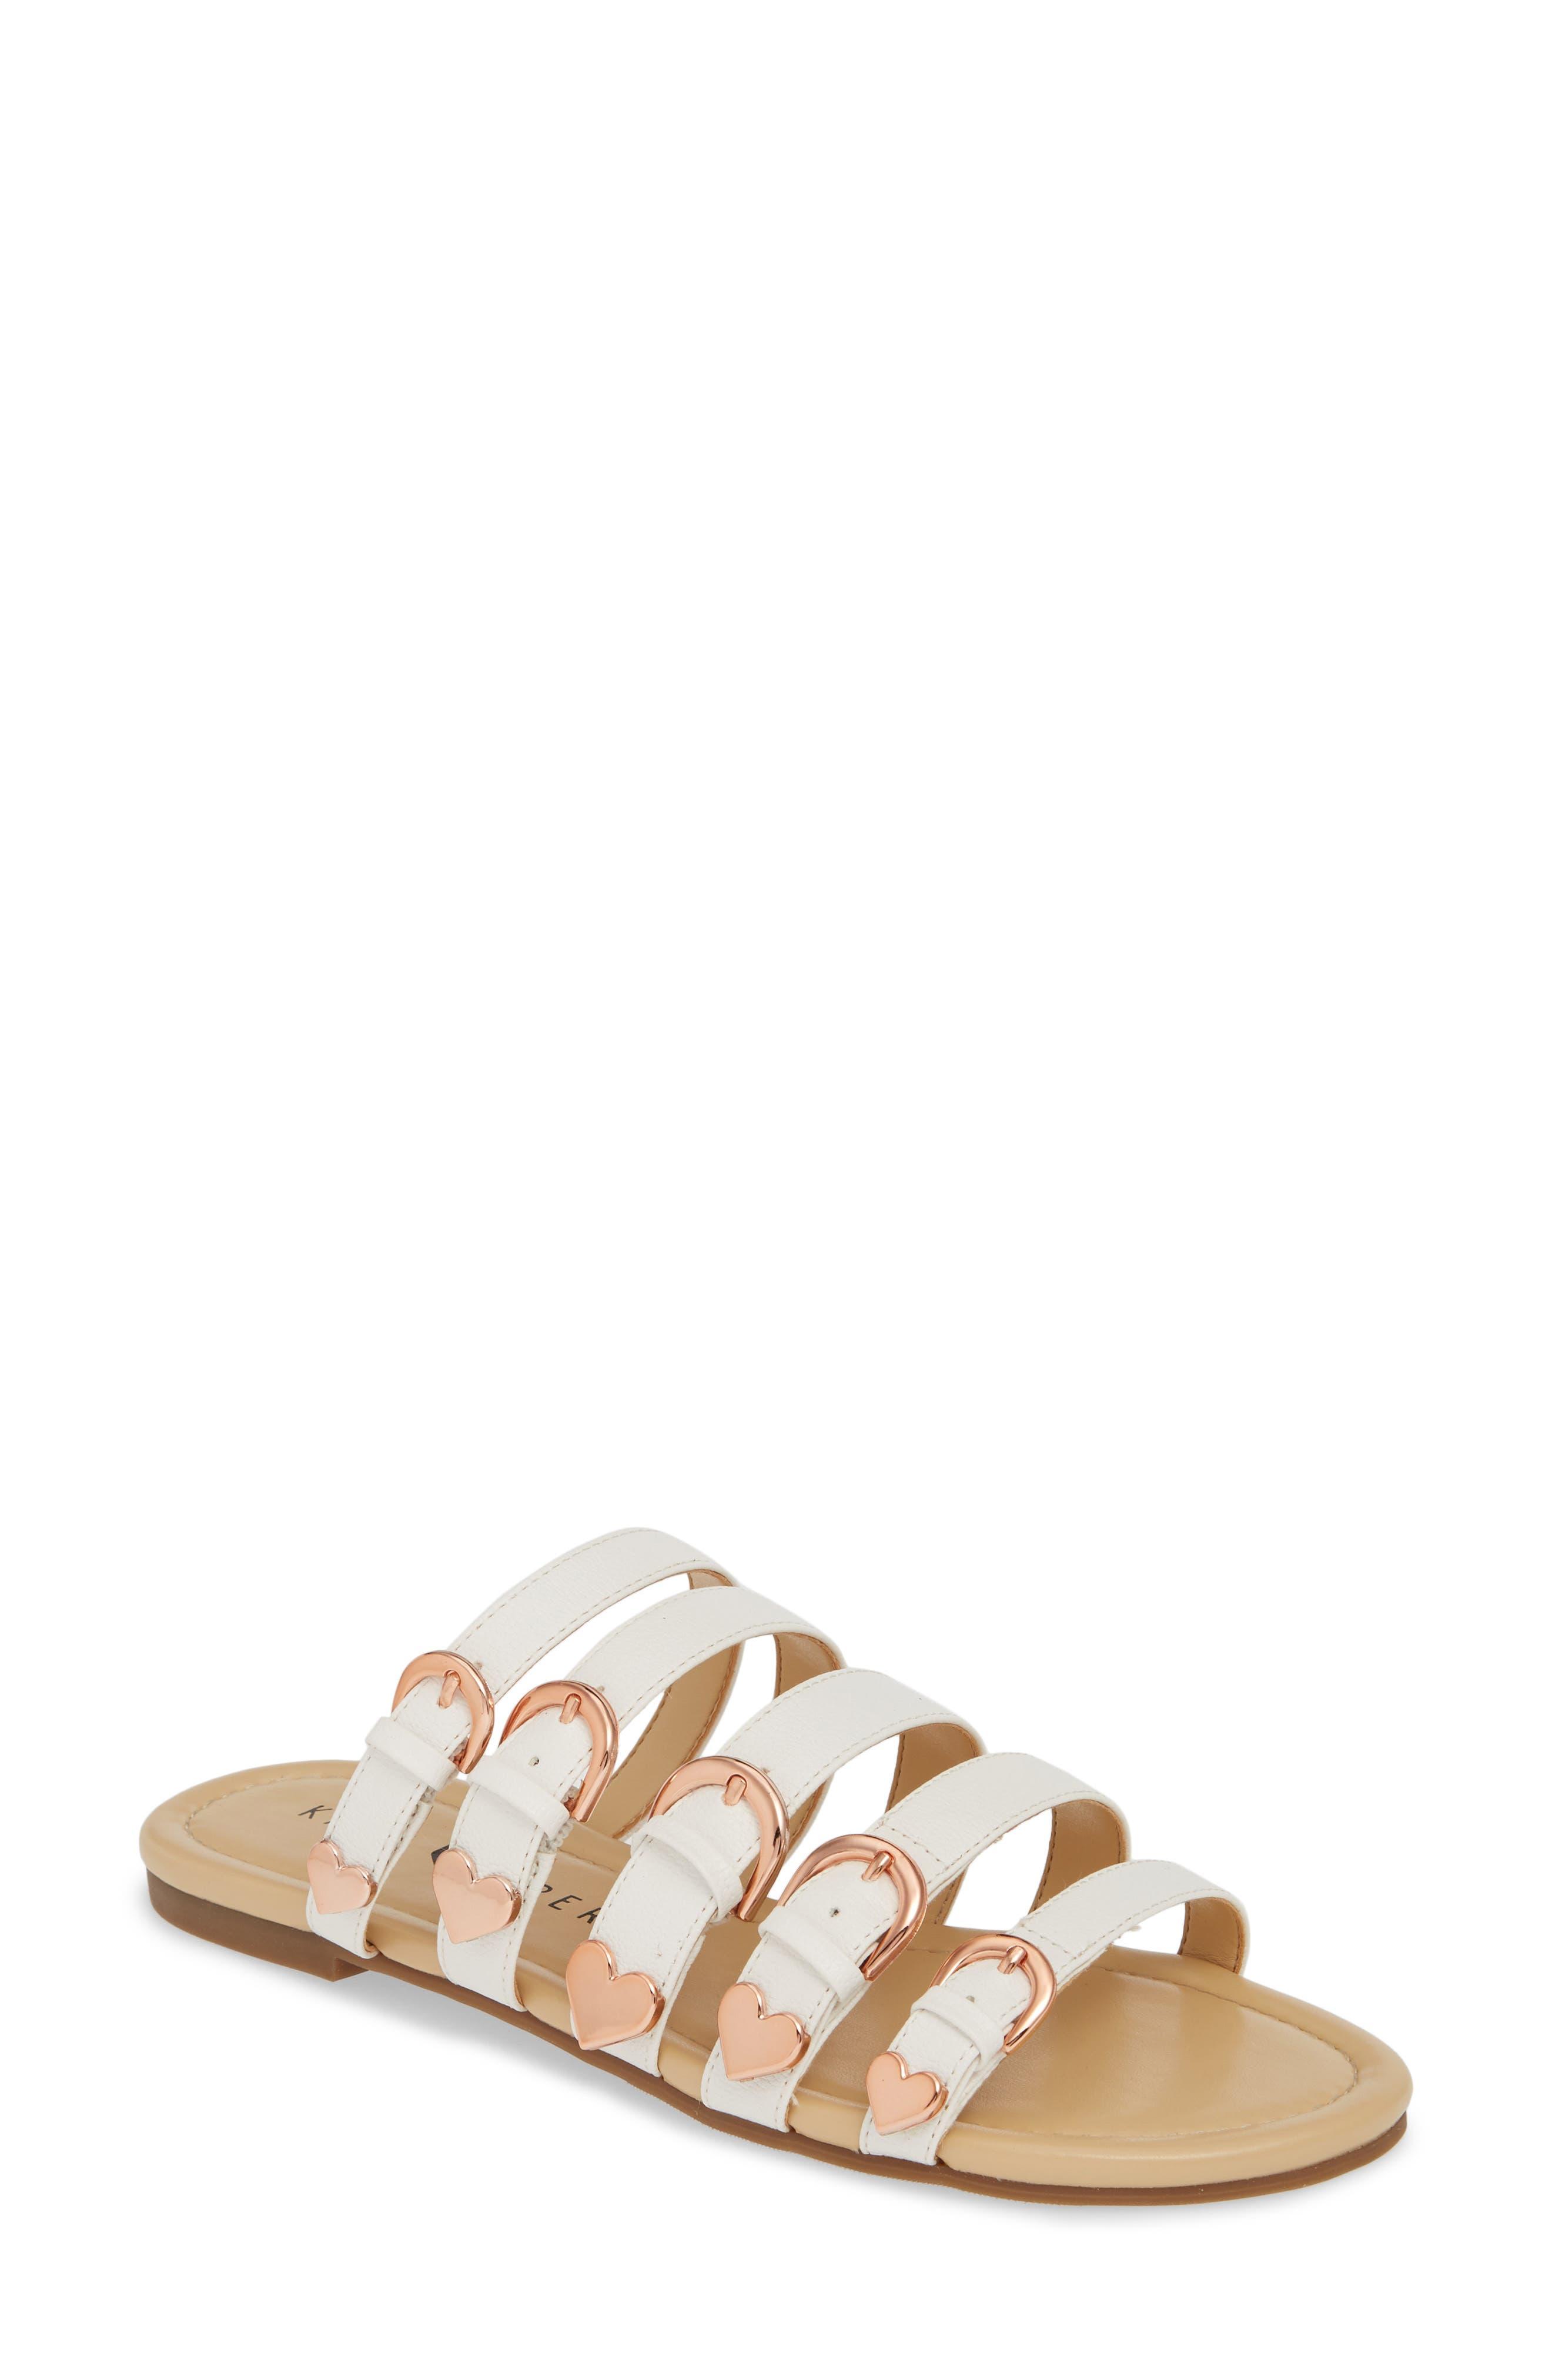 women's katy perry nikki flat slide sandal, size 7.5 m - white